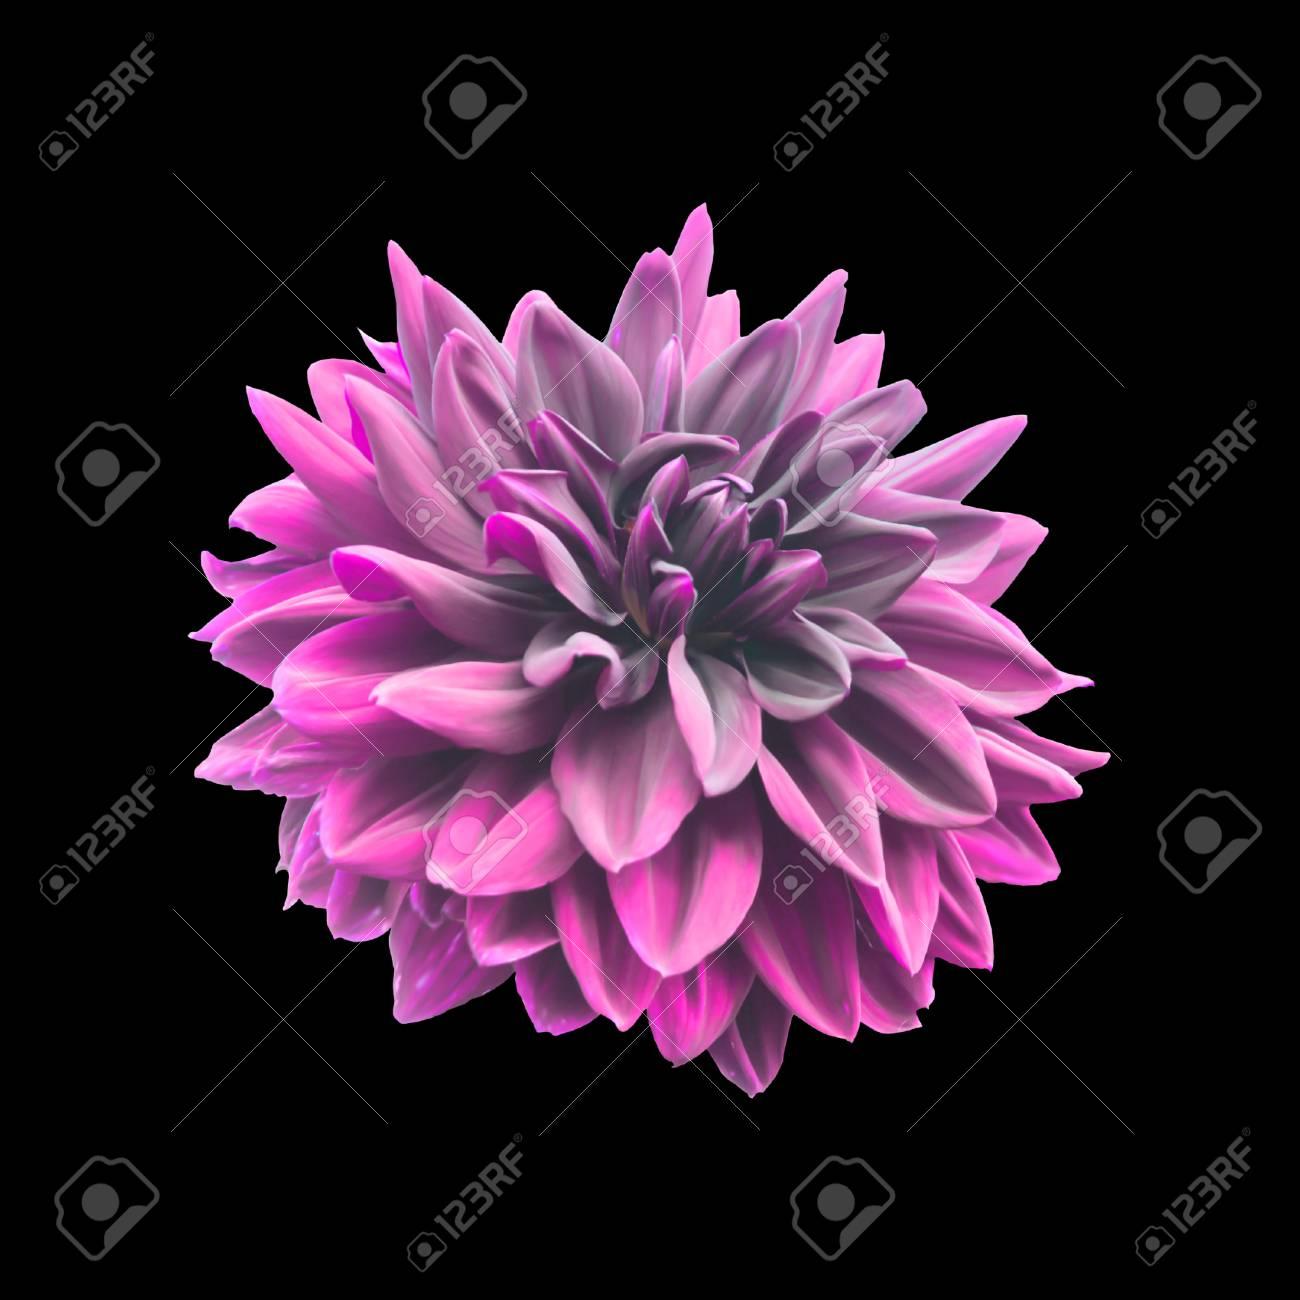 Pink dahlia flower isolated on black stock photo picture and pink dahlia flower isolated on black stock photo 35860577 izmirmasajfo